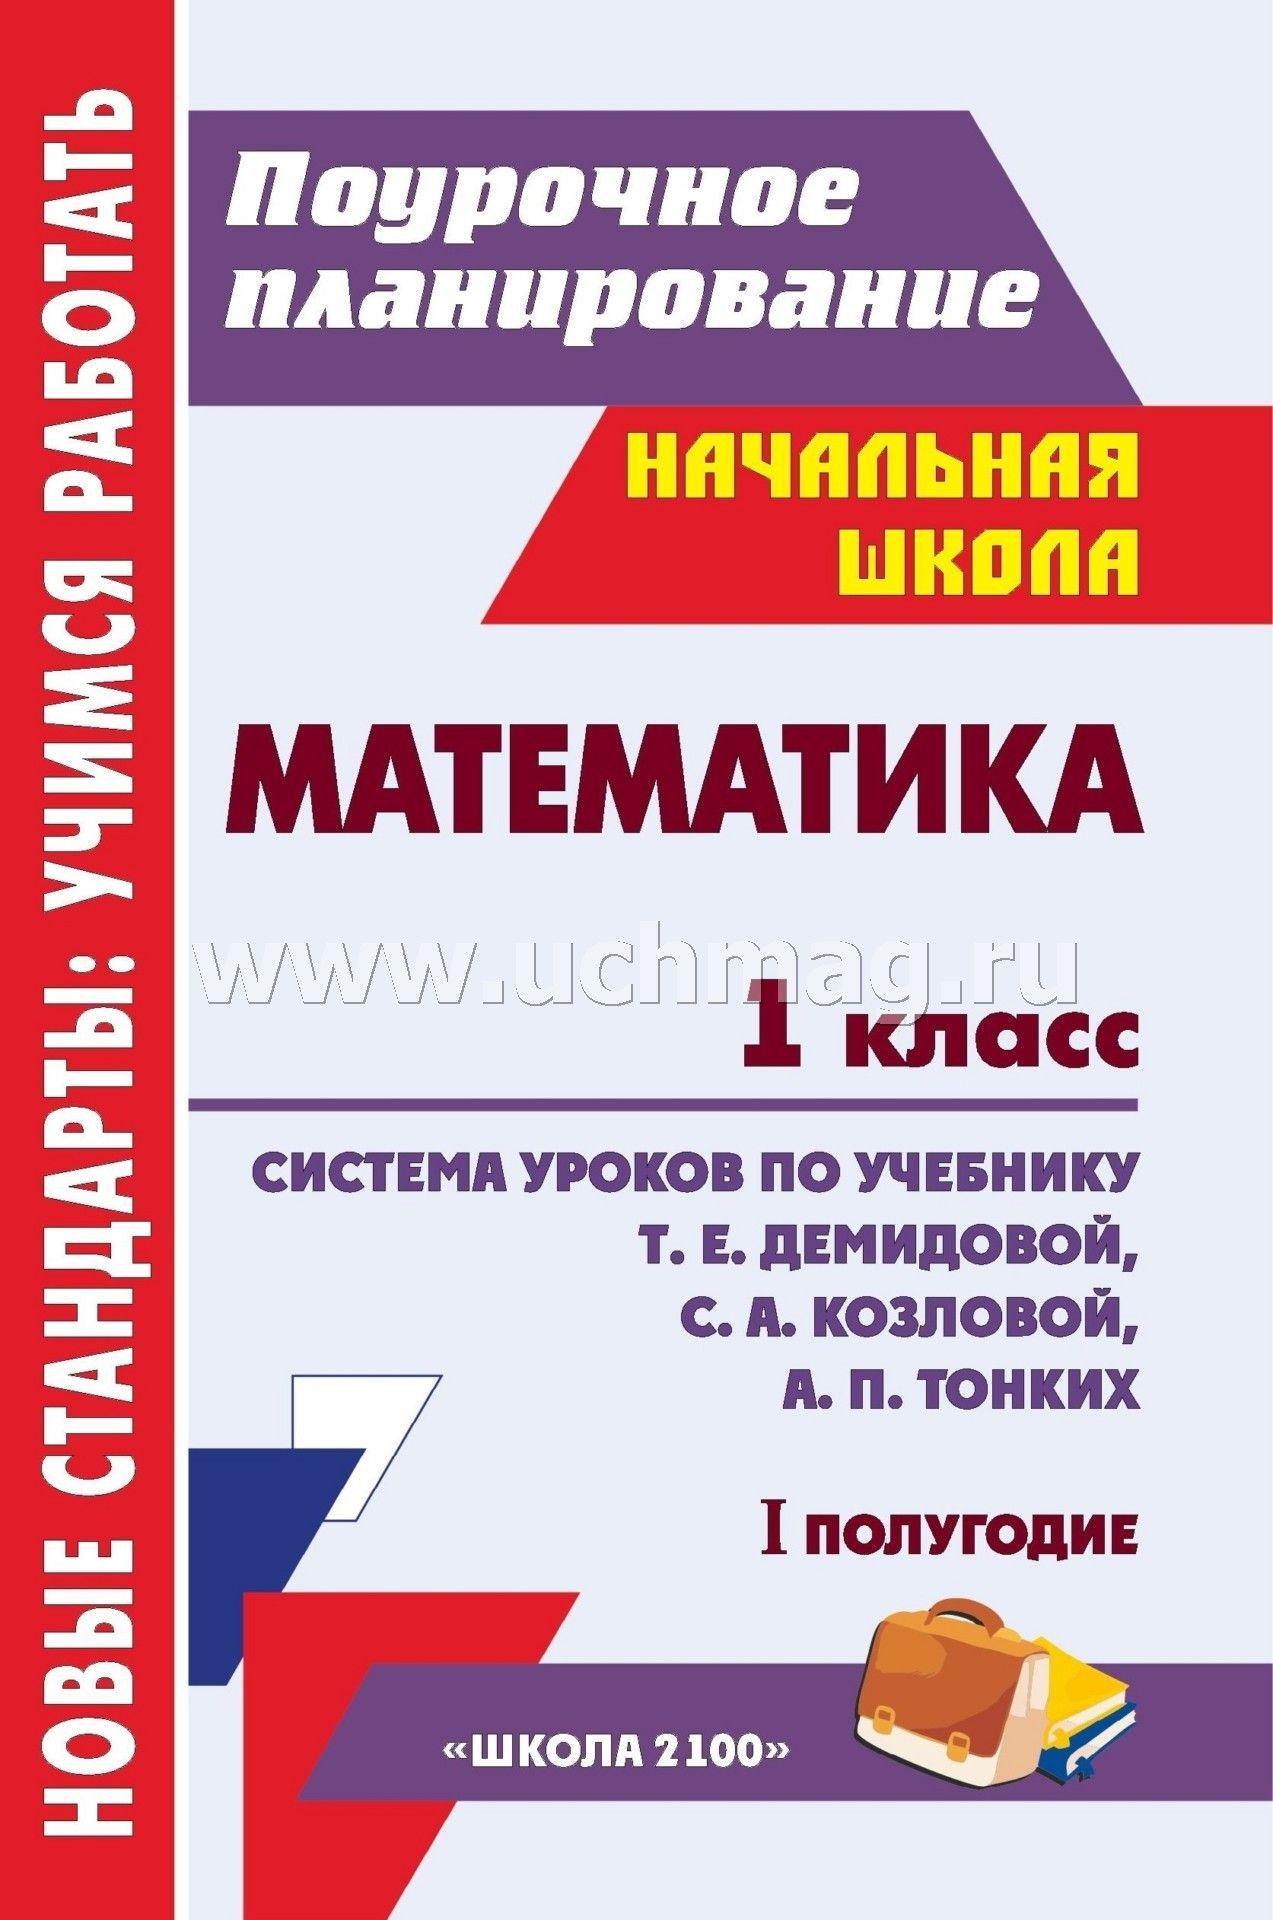 Задание 15.21 алгебра 8 класс